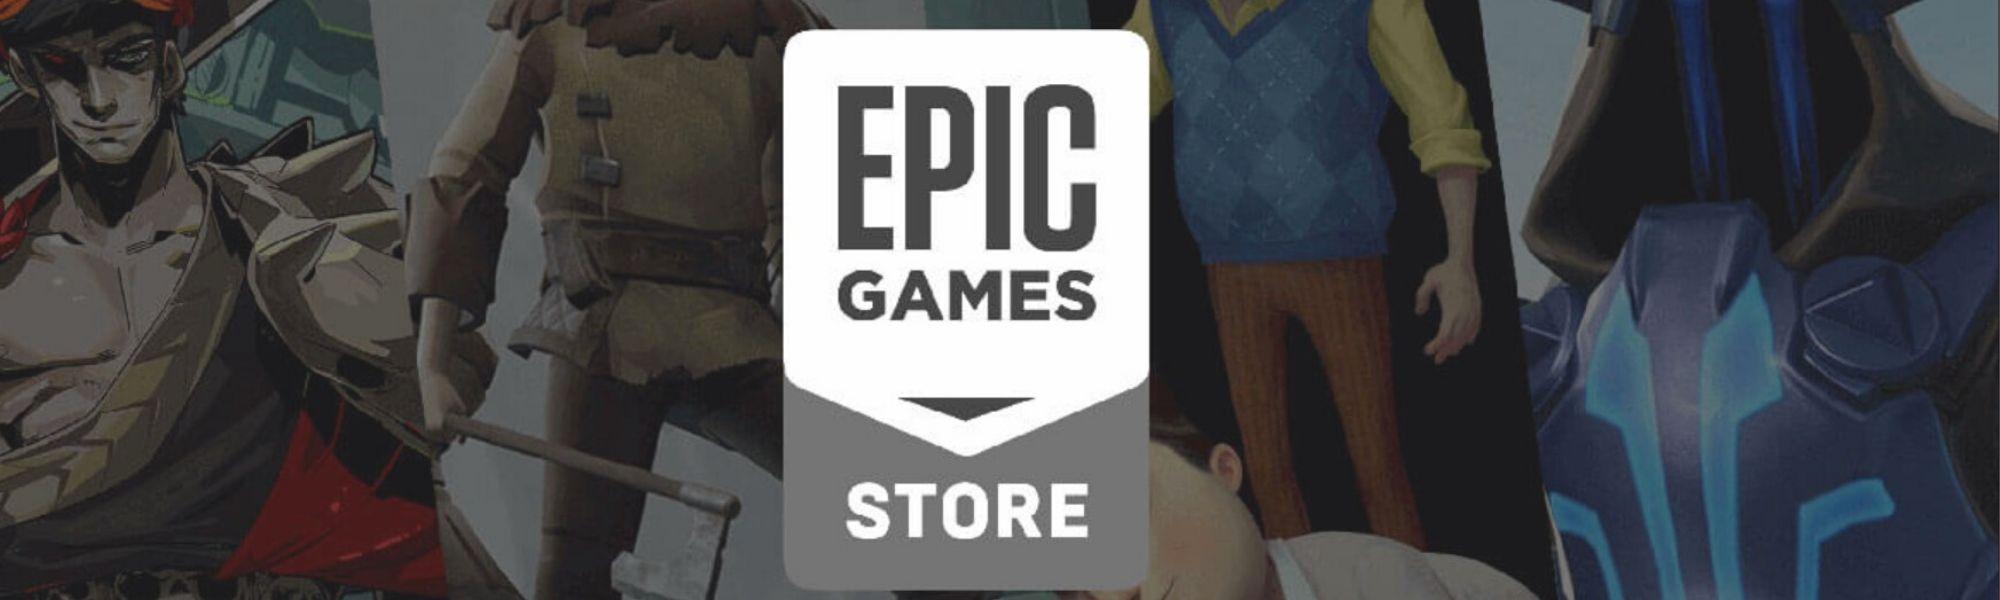 GTA V to dopiero początek - Epic Games Store (podobno) udostępni kolejne mega hity za darmo! 19